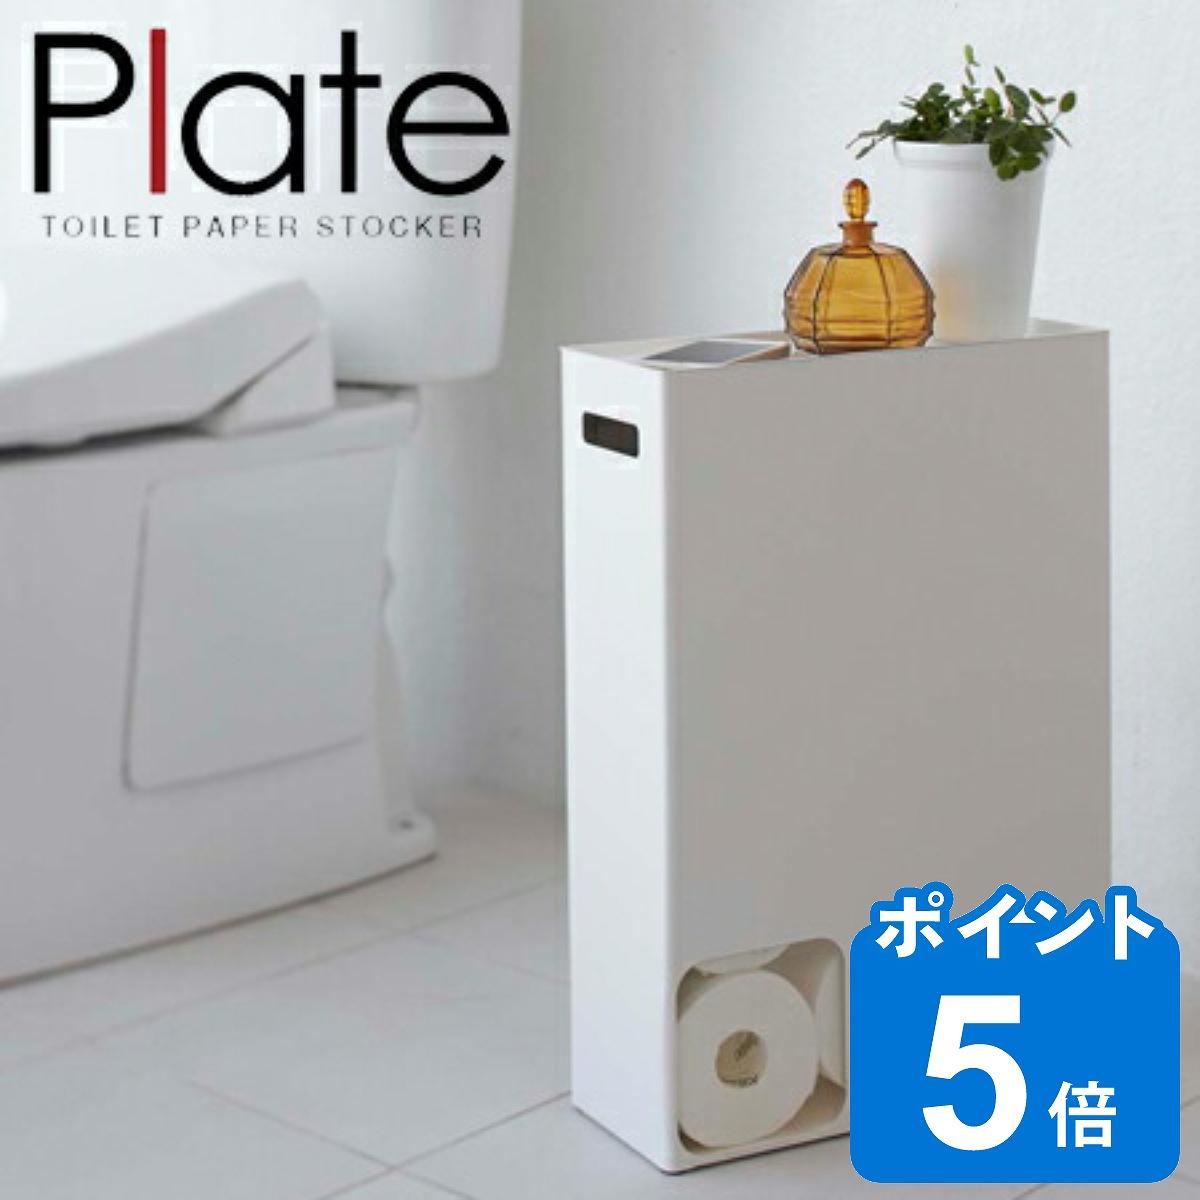 Toilet Paper Magazine Plate Plate Steel Toilet Paper Toilet Paper Rack (storage  Rack Stand Toilet Storage Slim Toilet Brush Storage Case Storage Shelf)